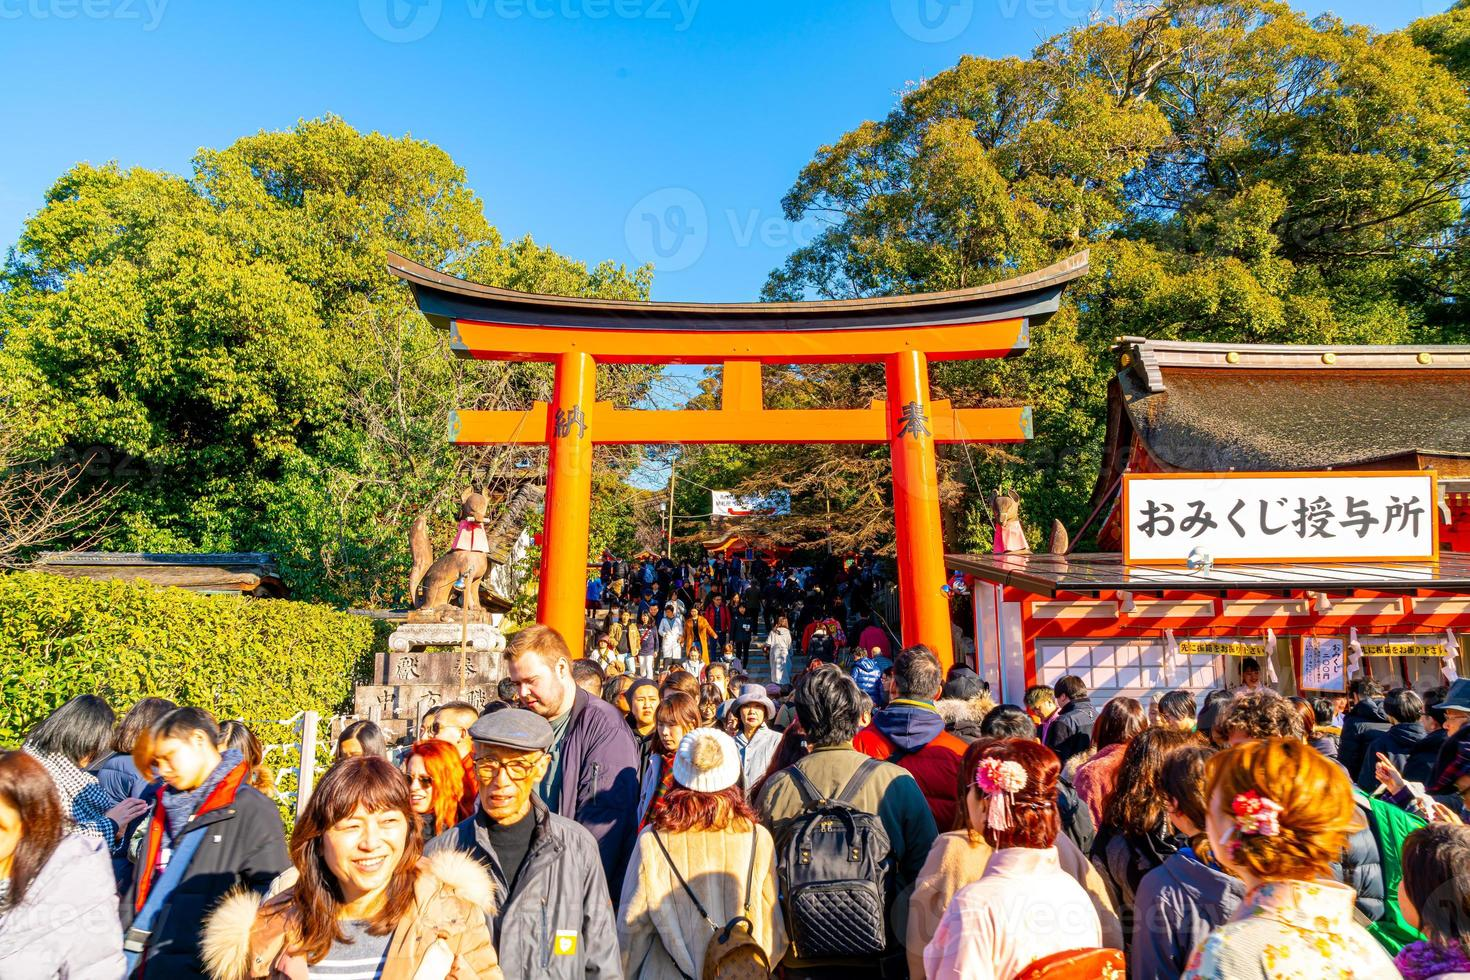 kyoto, japan - 11. januar 2020 - rote torii-tore bei fushimi inari taisha mit touristen und japanischen studenten. Fushimi Inari ist das wichtigste Shinto-Heiligtum. foto